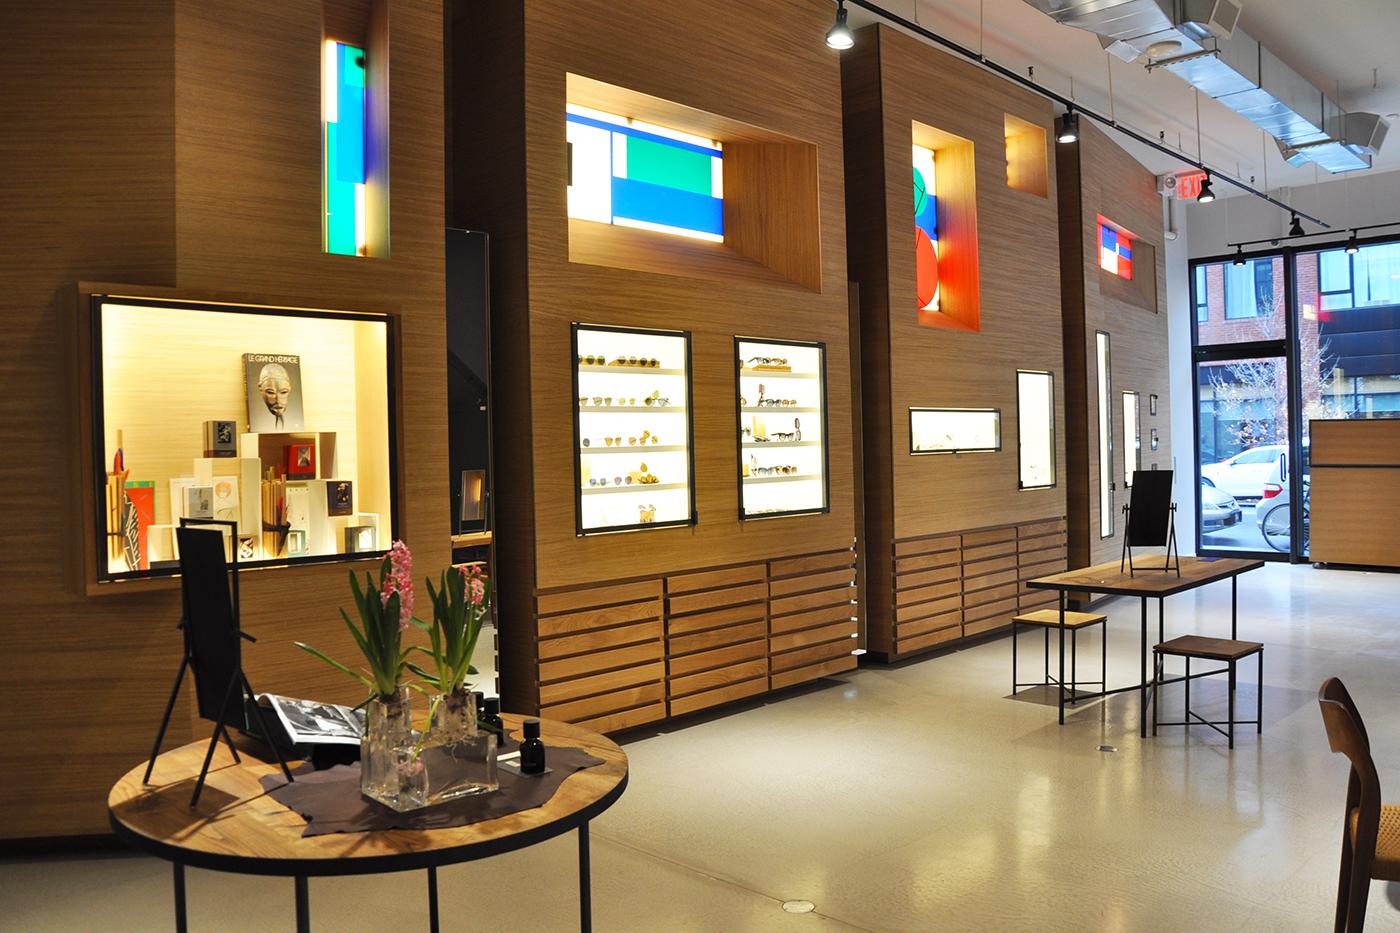 Optical shop Atelire Mira store interior - Williamsburg, Brooklyn